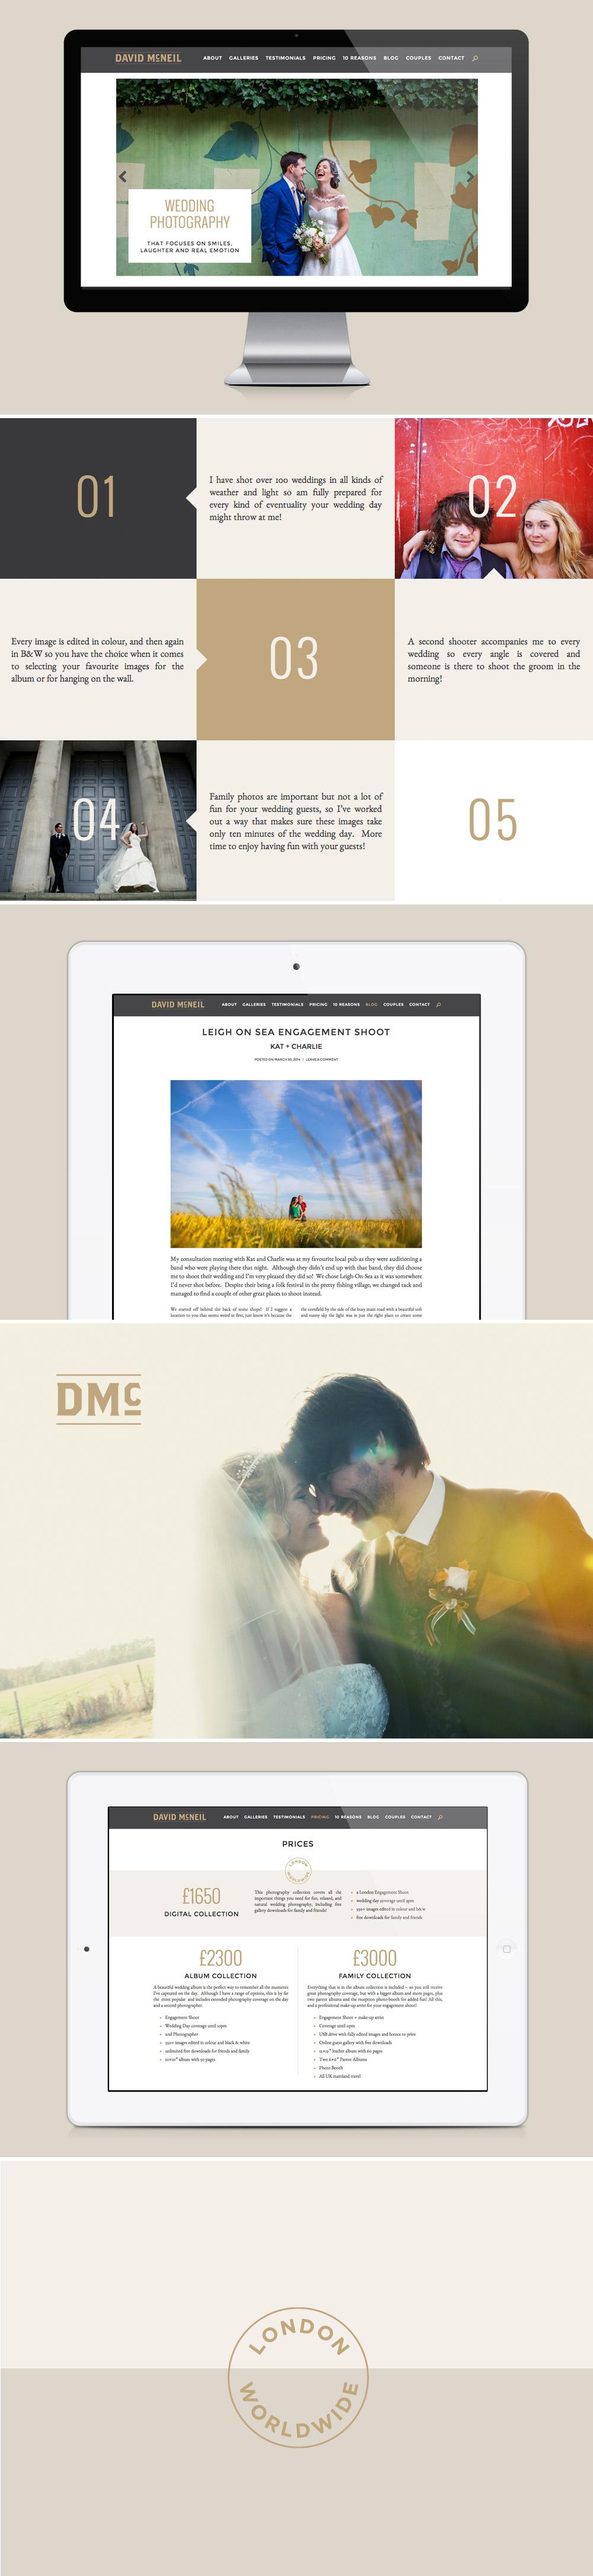 Branch   David McNeil Photography Website